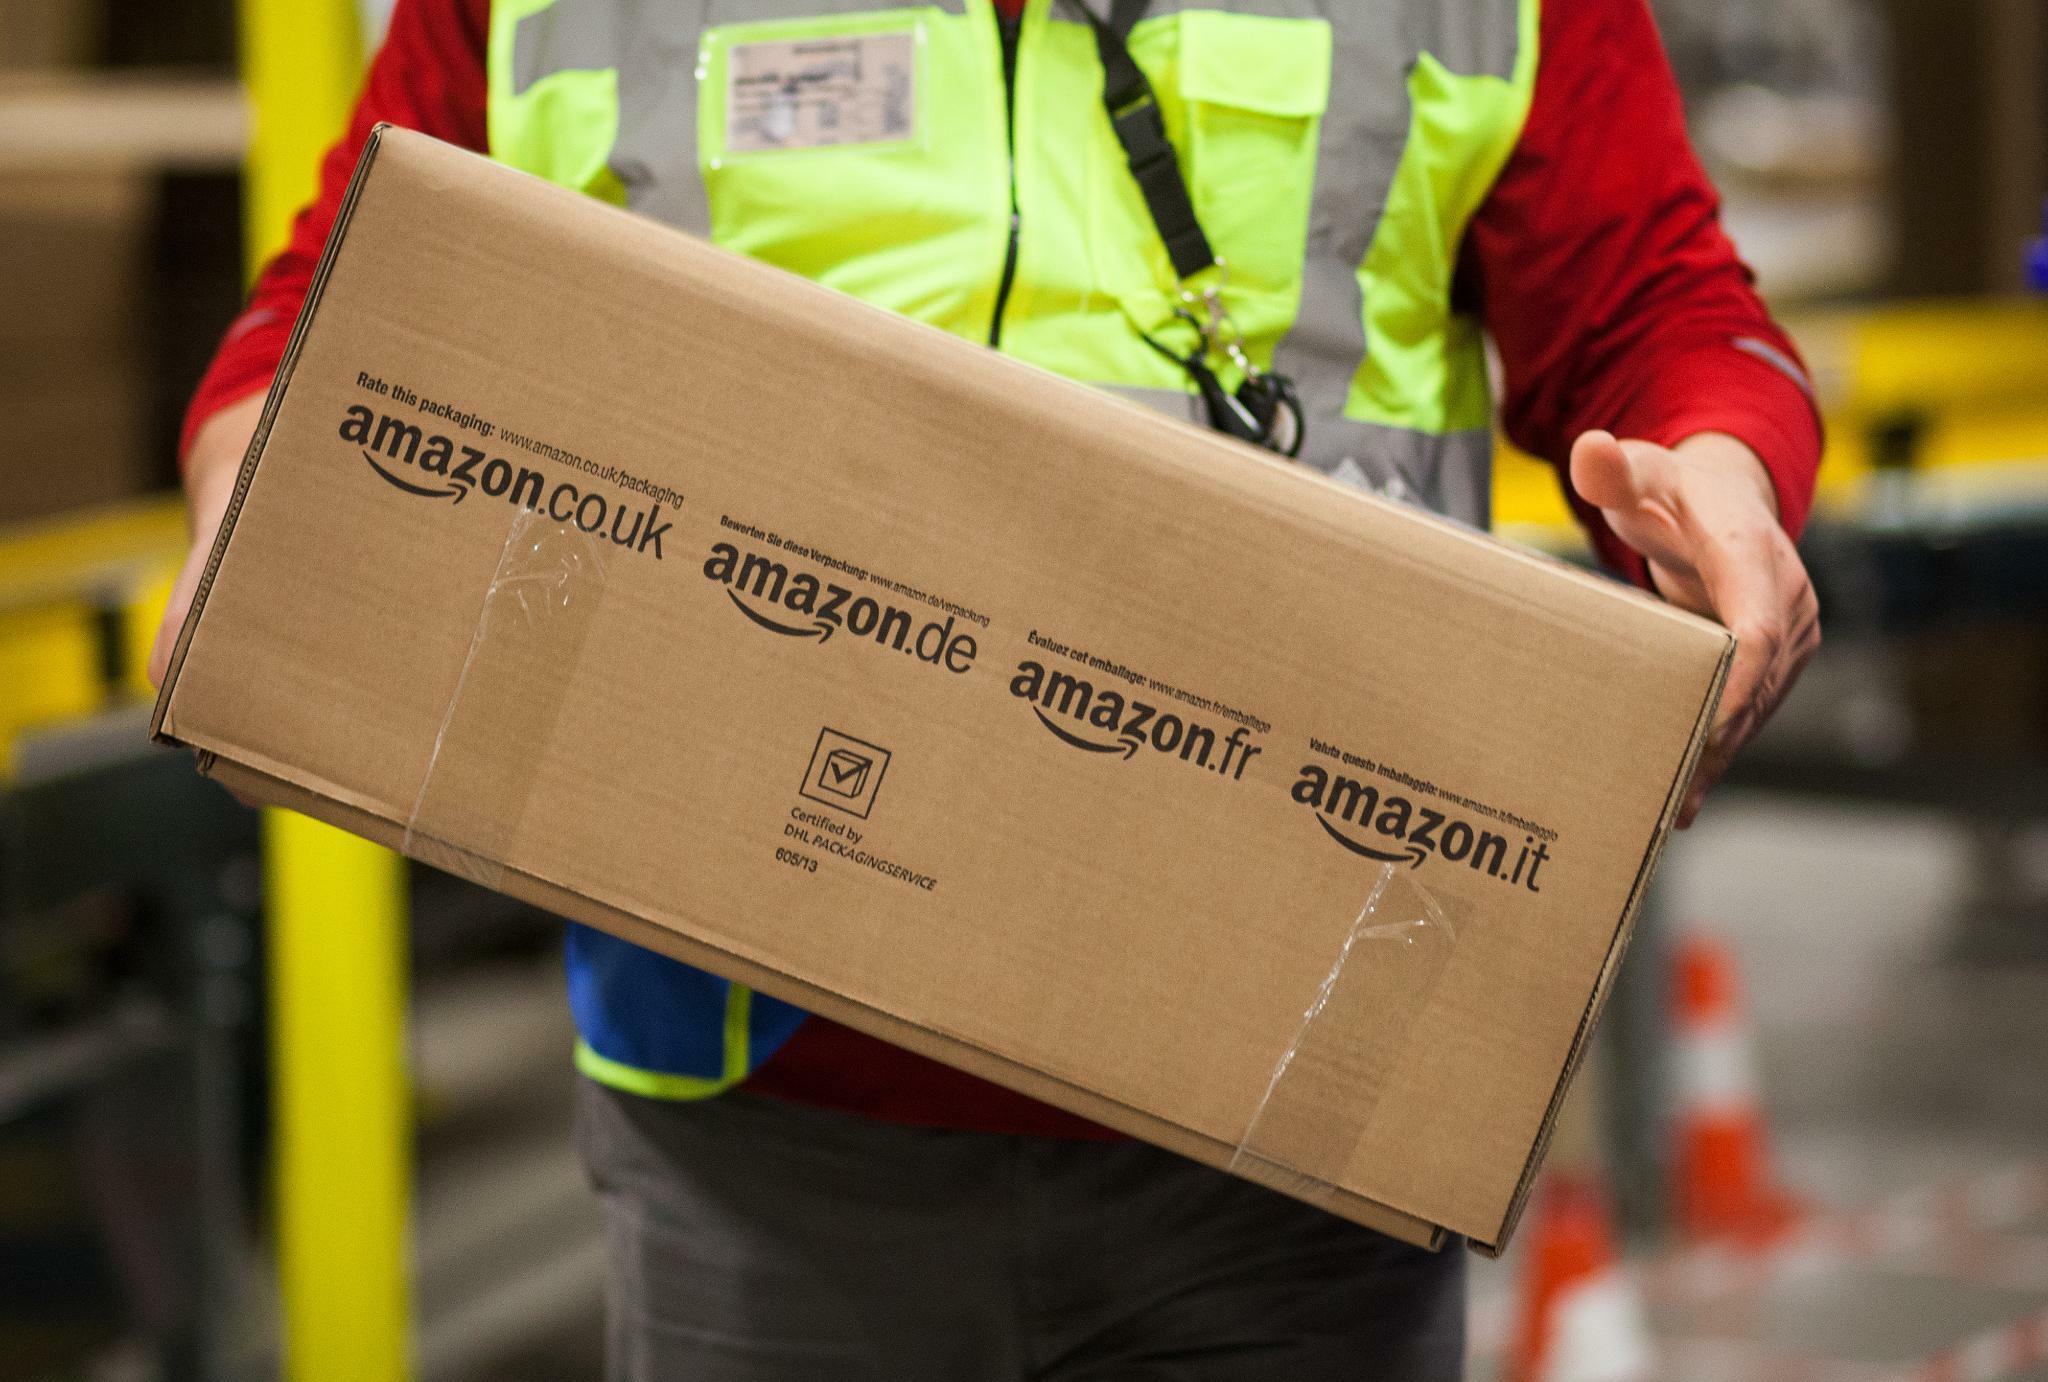 Amazon: Online-Händler testet neue Versand-Option